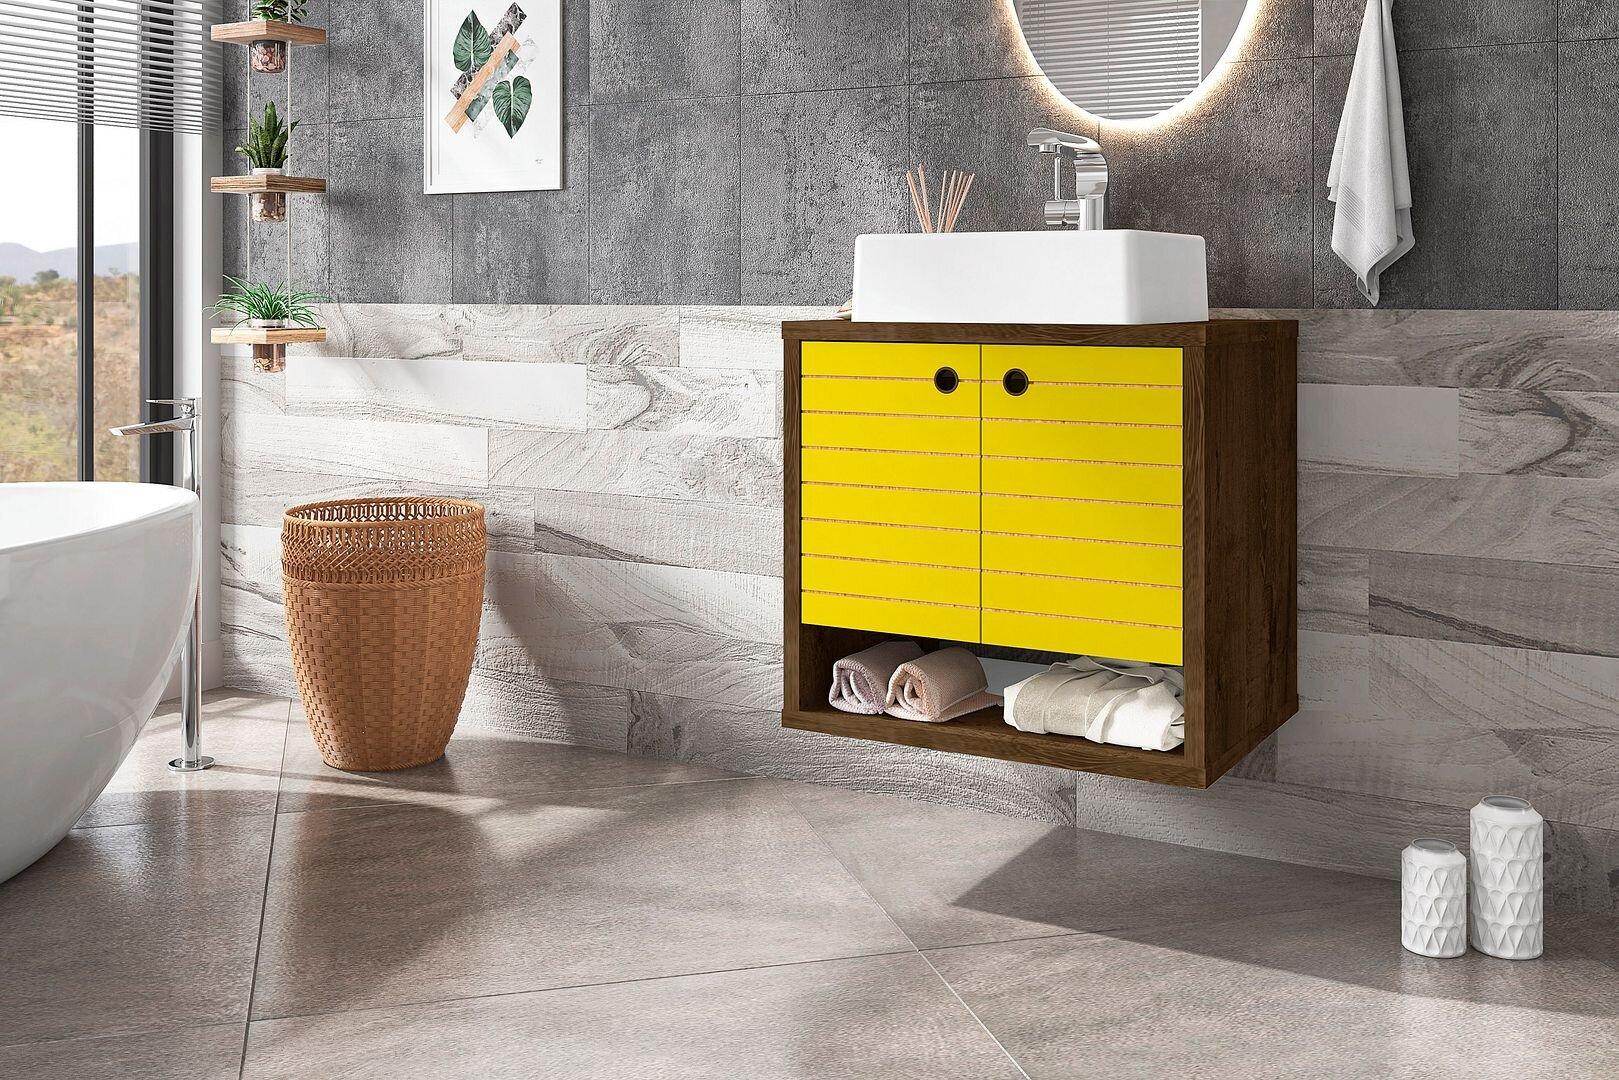 Wall Mounted Floating Yellow Bathroom Vanities You Ll Love In 2021 Wayfair